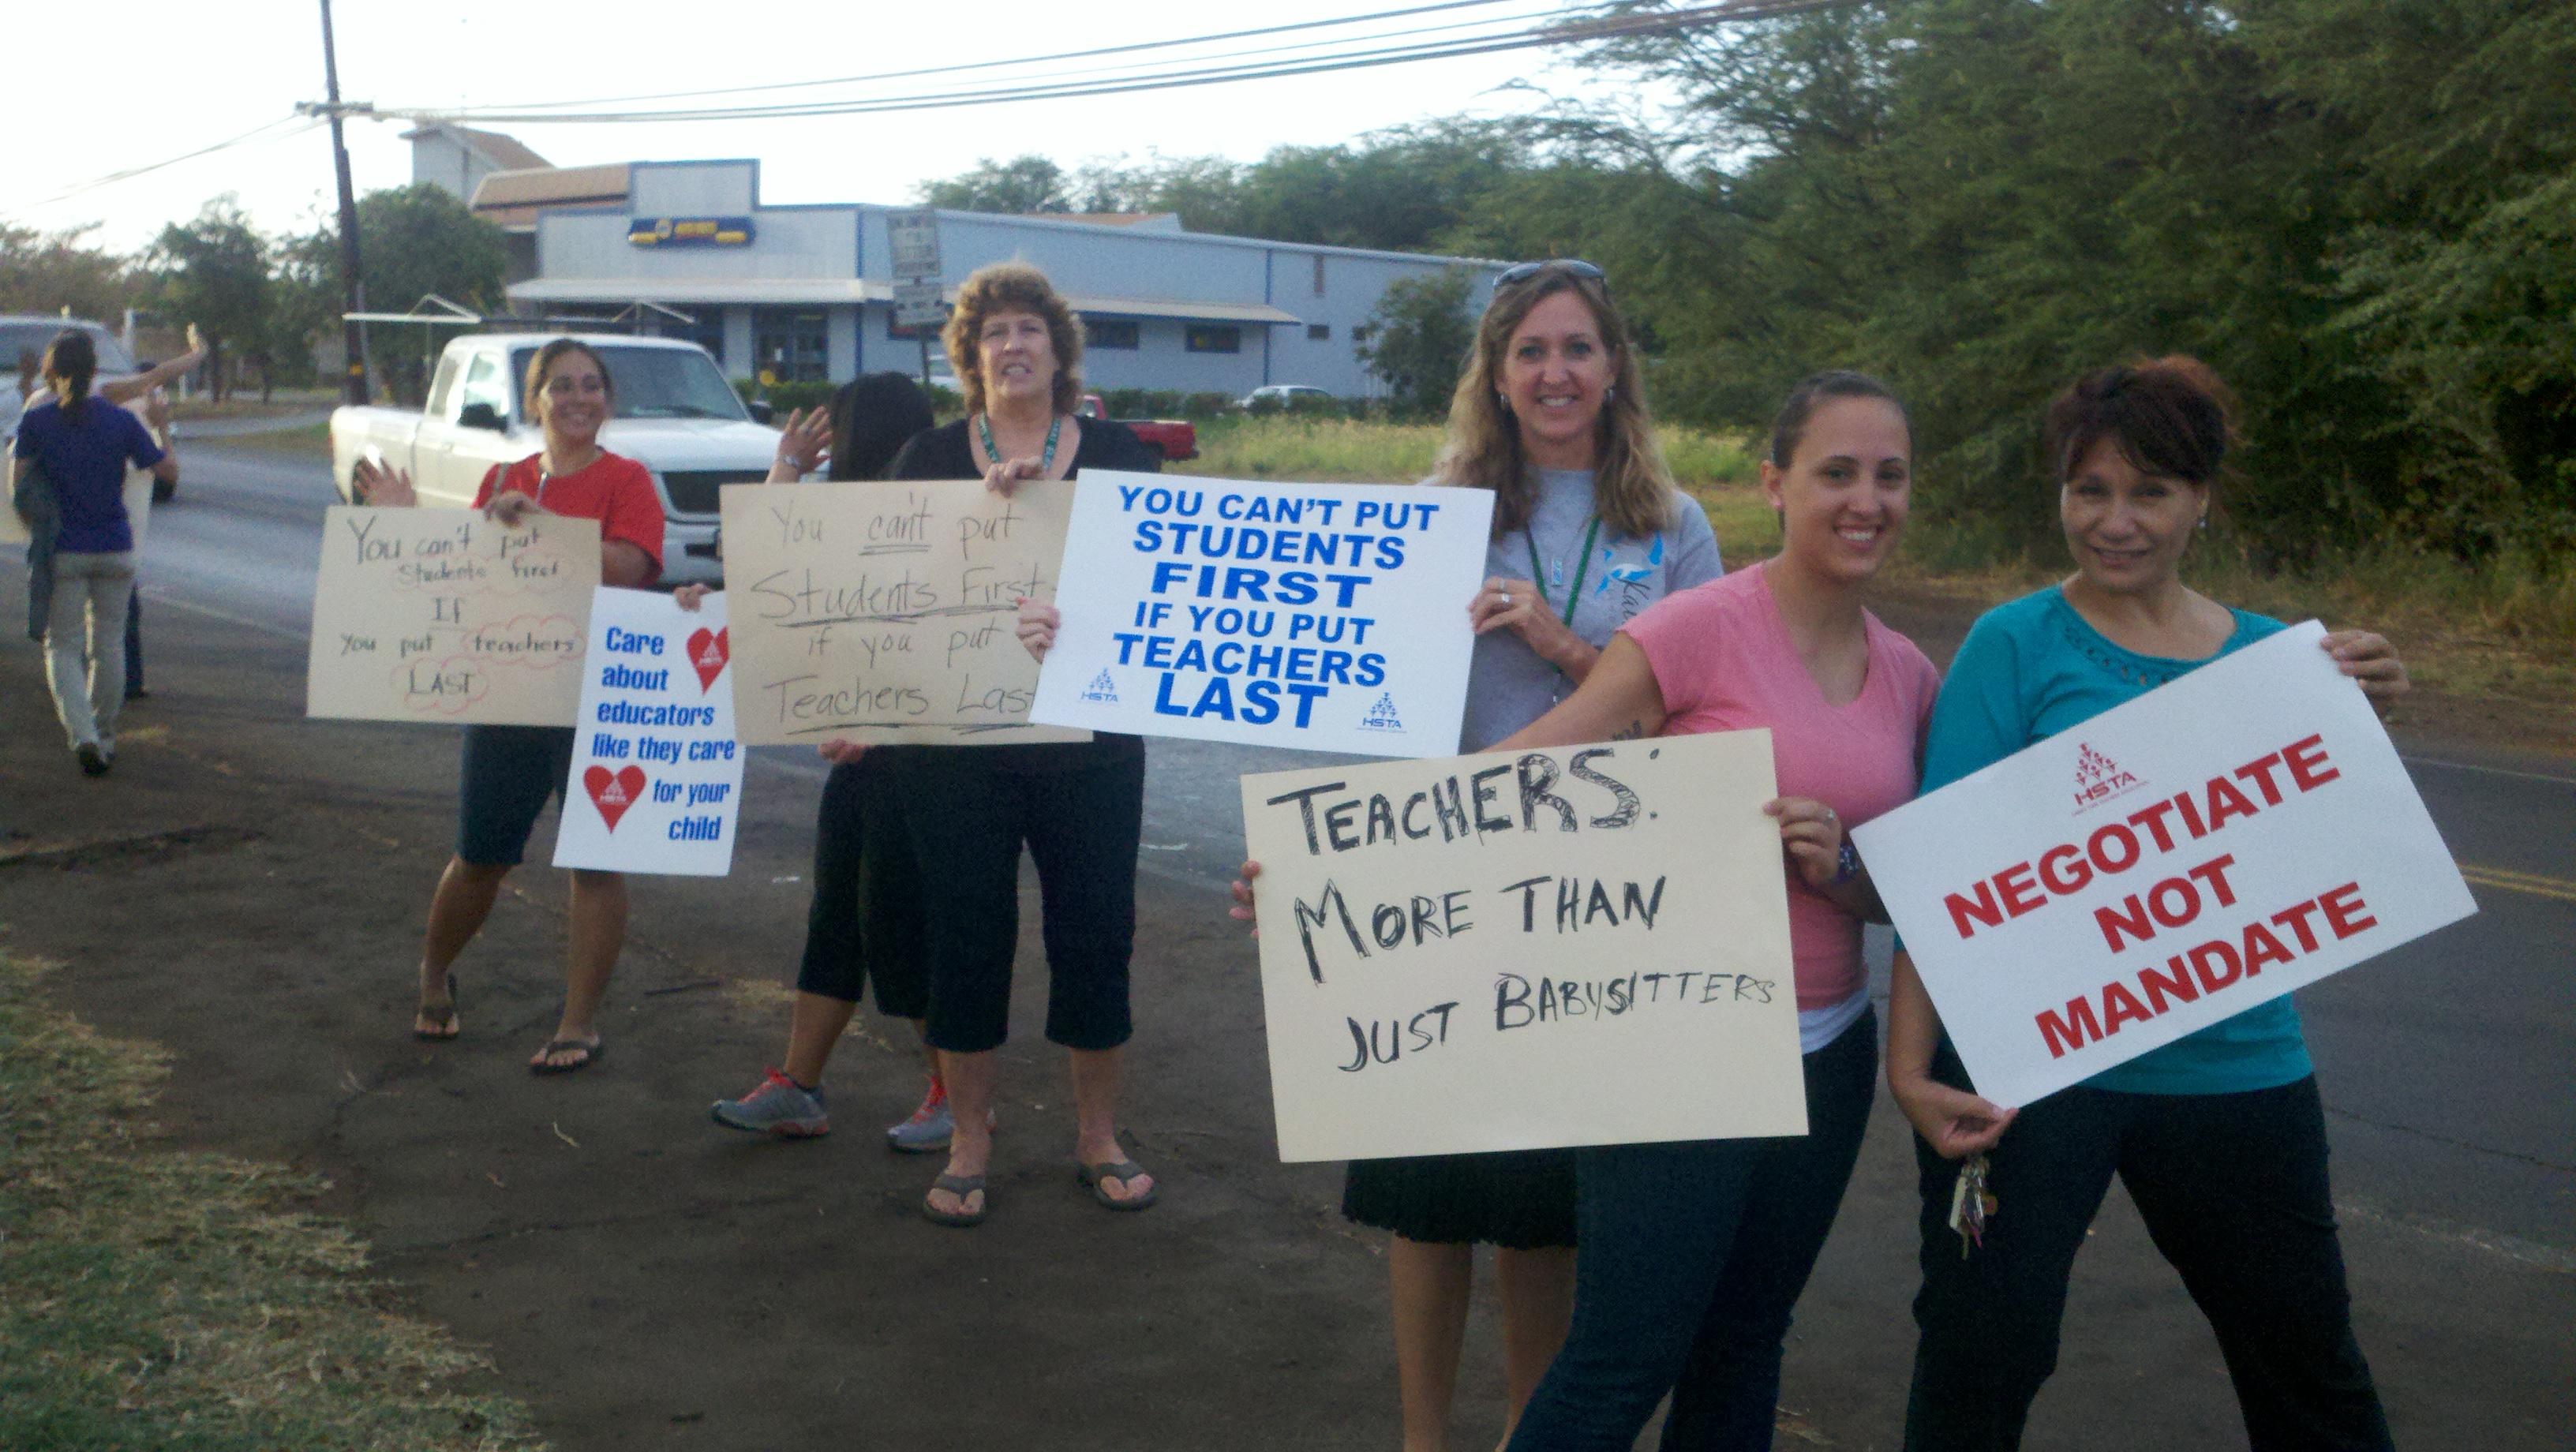 Teachers protest in front of Kaunakakai School last week. Photo by Jenn Whitted